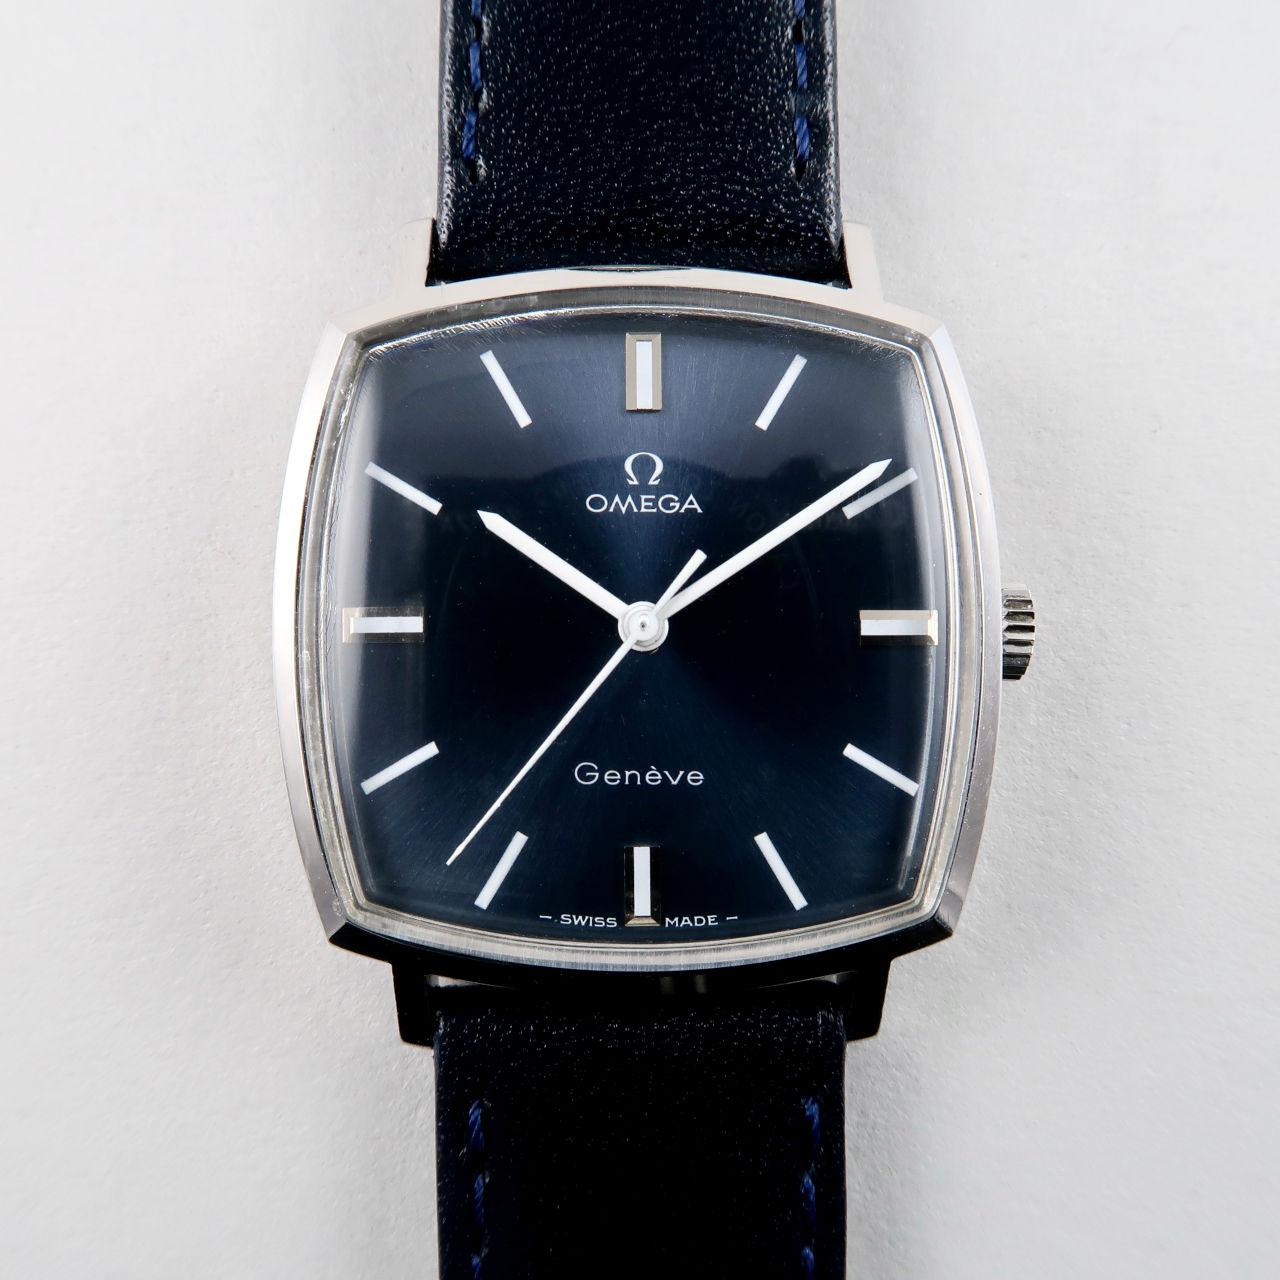 Omega Genève Ref. 131.022 circa 1970 blue dial